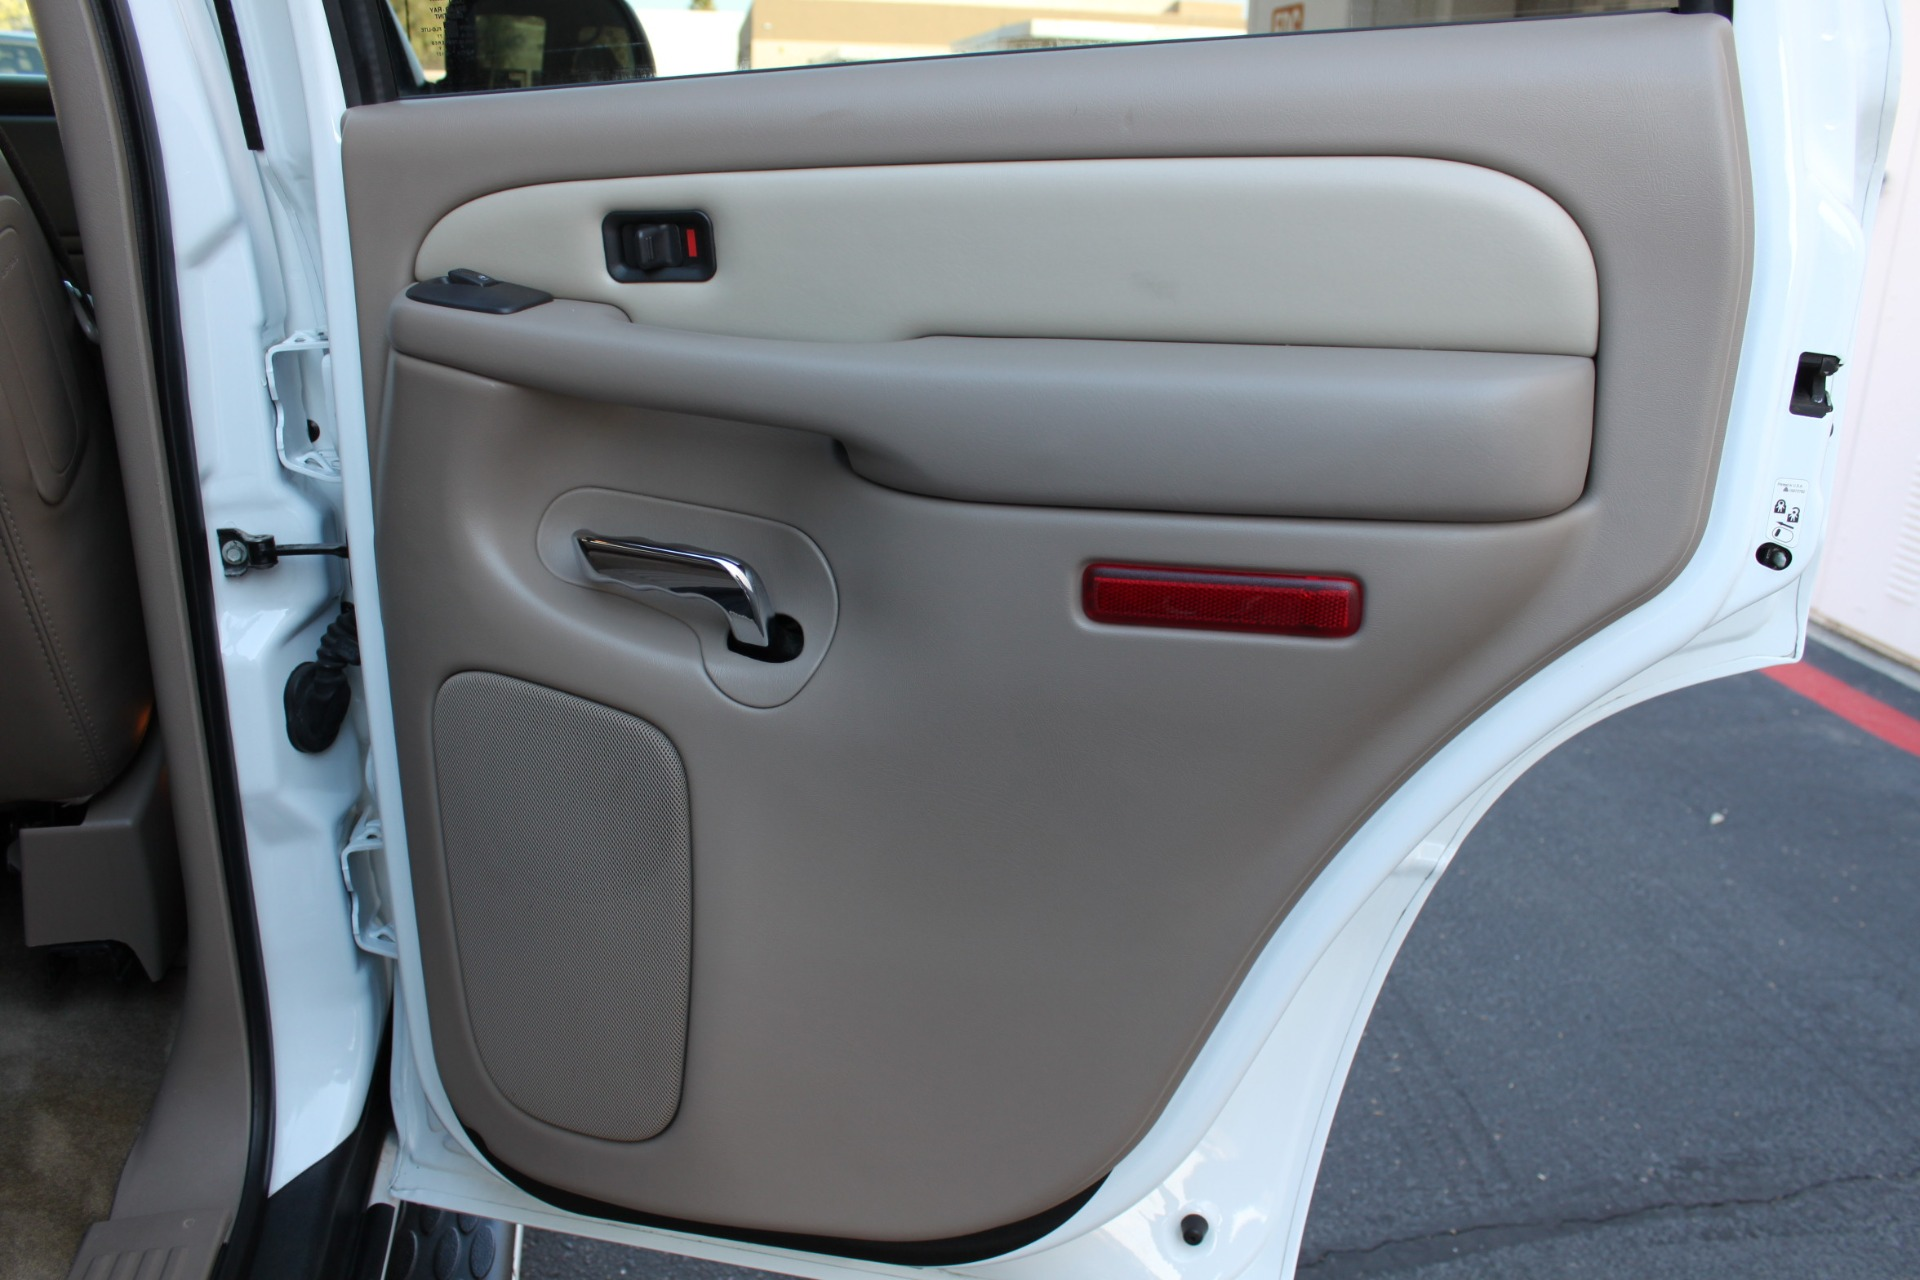 Used-2006-GMC-Yukon-Denali-AWD-Audi